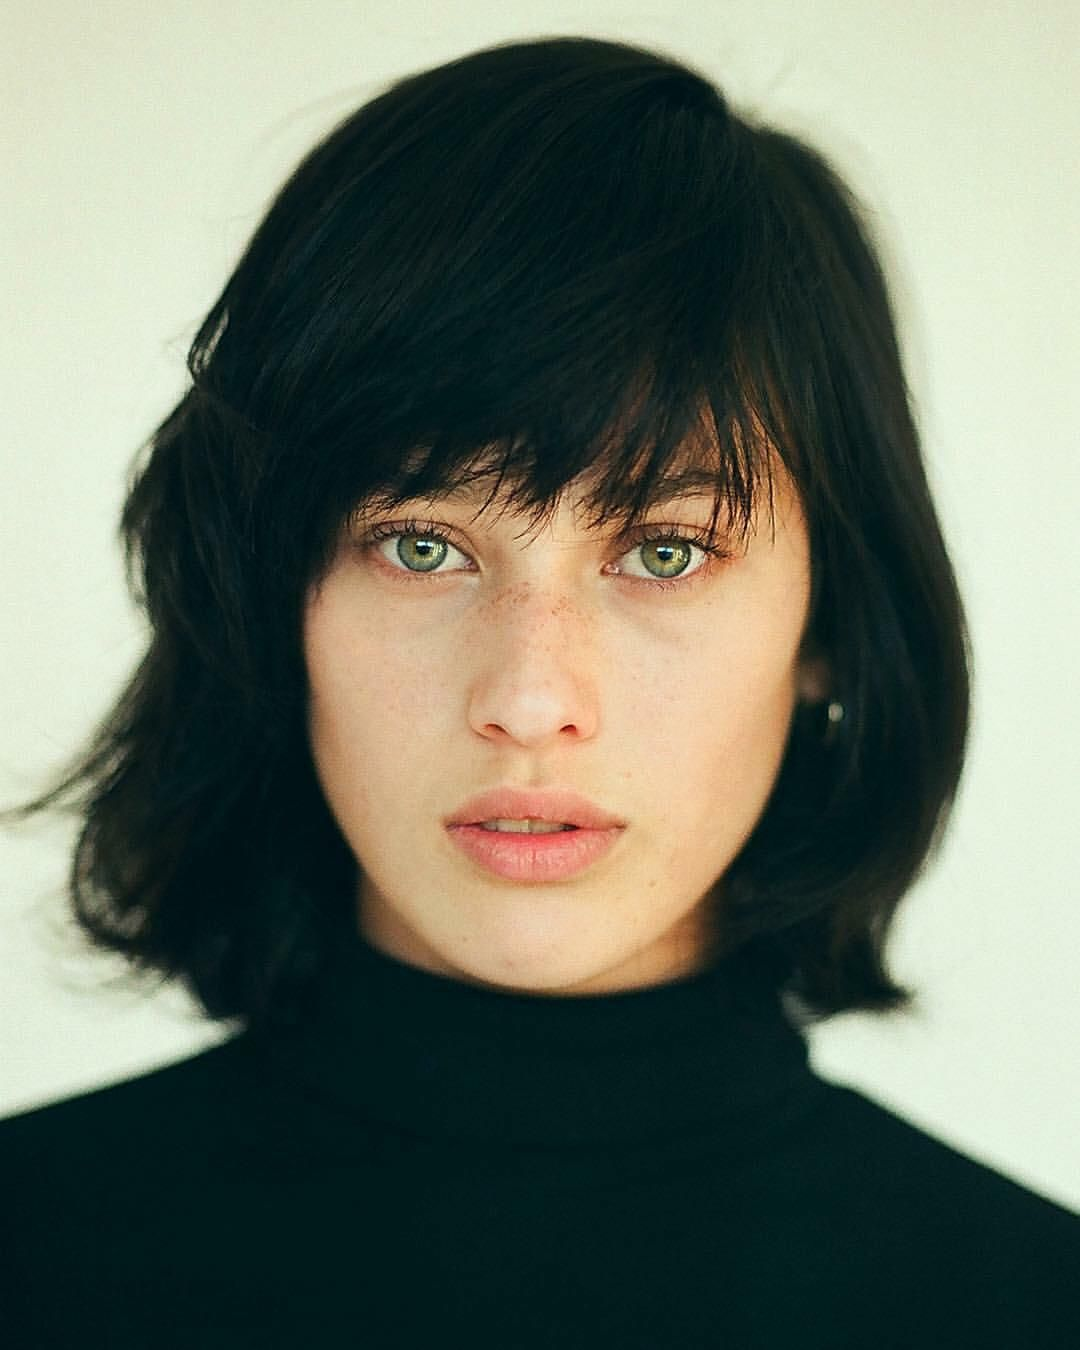 Ohlydiagraham Hair Colour For Green Eyes Black Hair Green Eyes Cool Hair Color